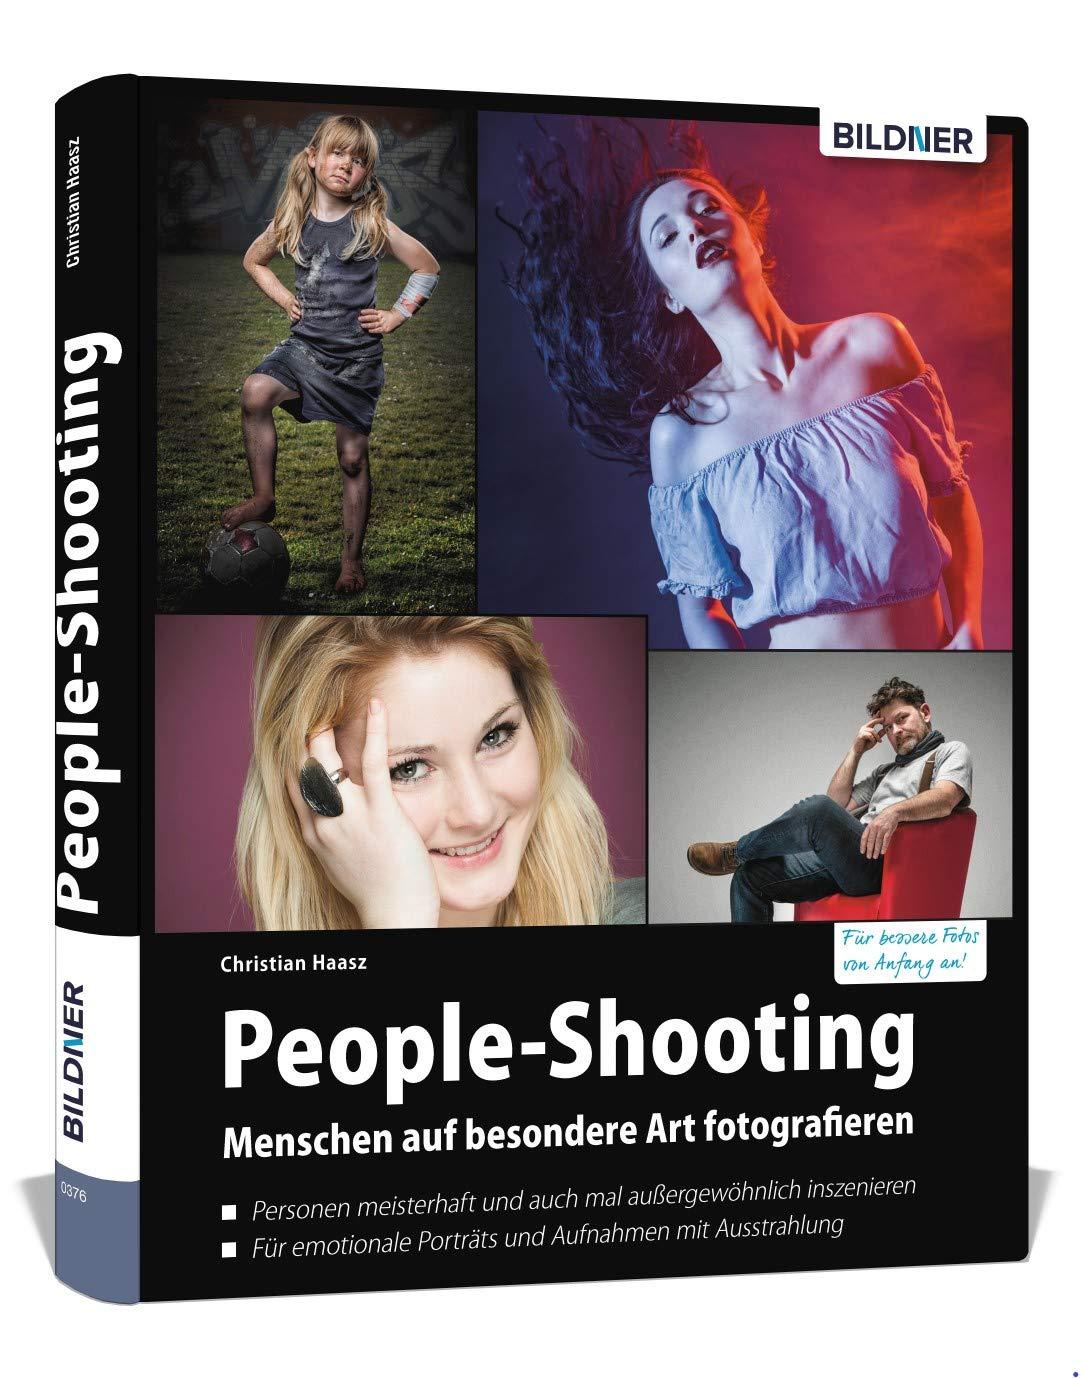 People Shooting Menschen Auf Besondere Art Fotografieren Christian Haasz Bücher